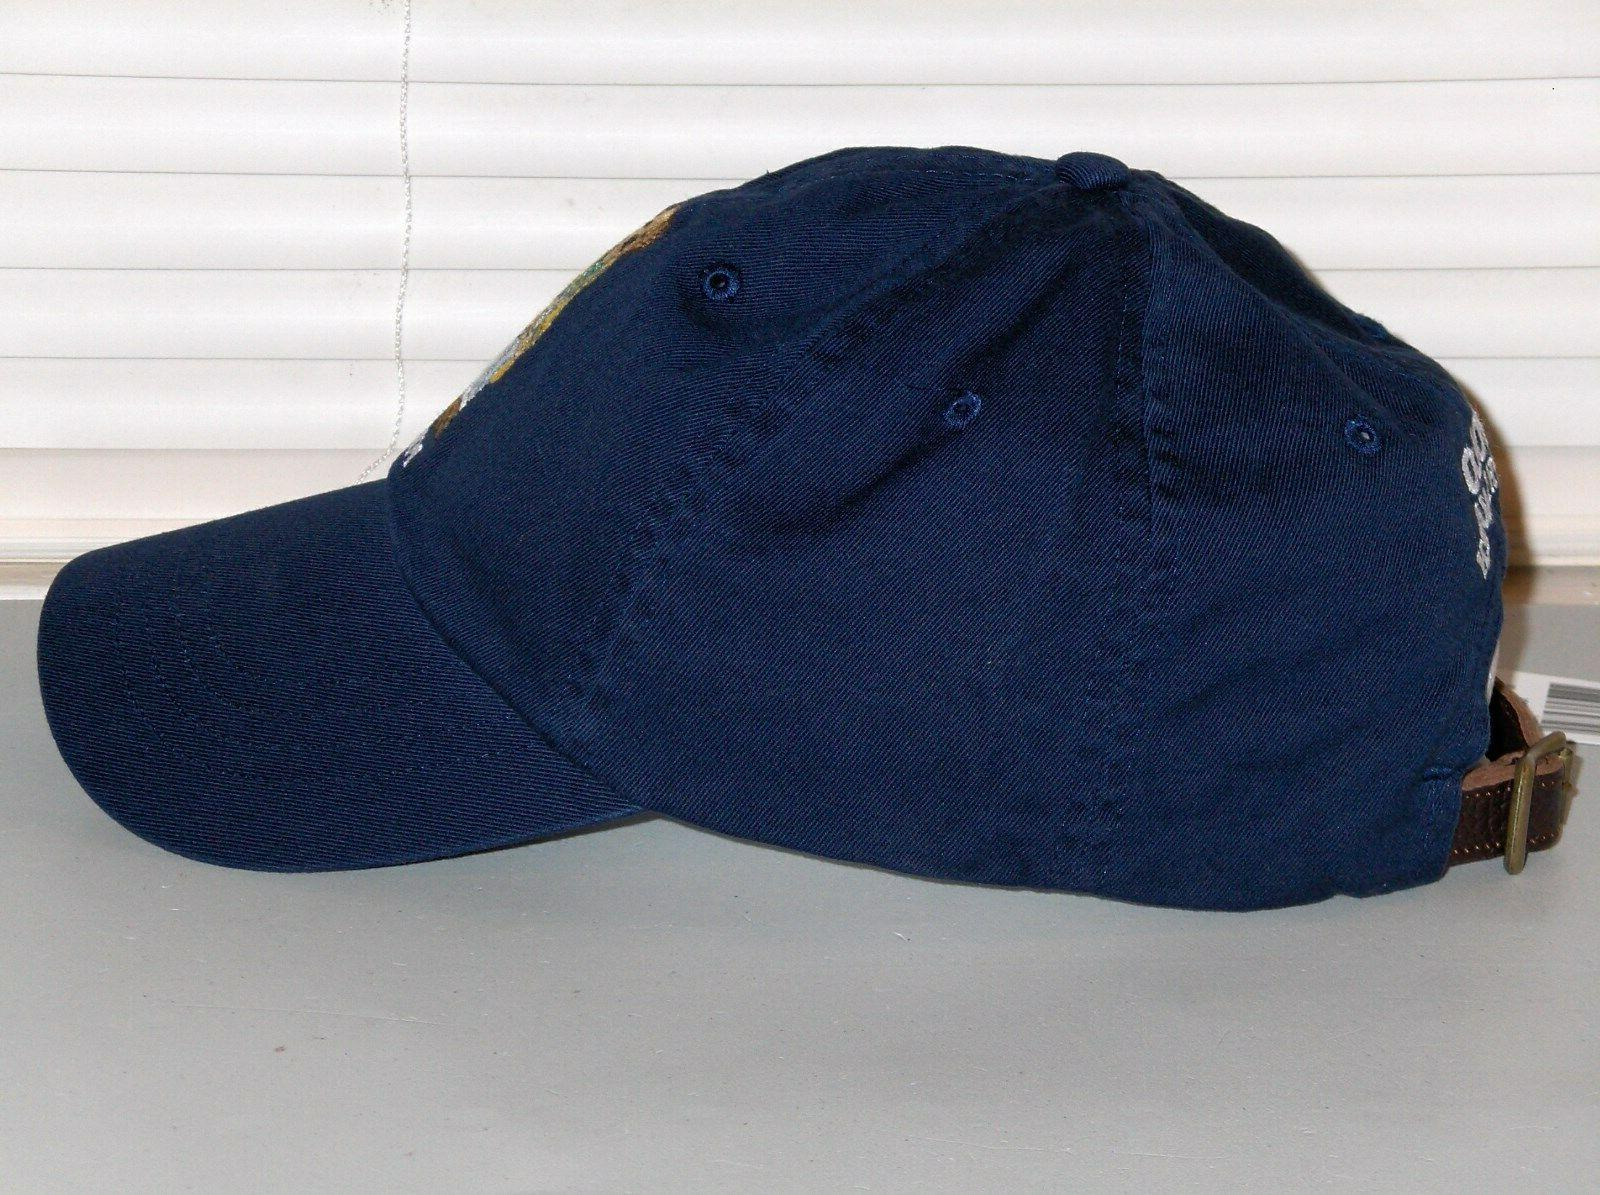 POLO RALPH LAUREN Raincoat Hat, LEATHER Navy Blue